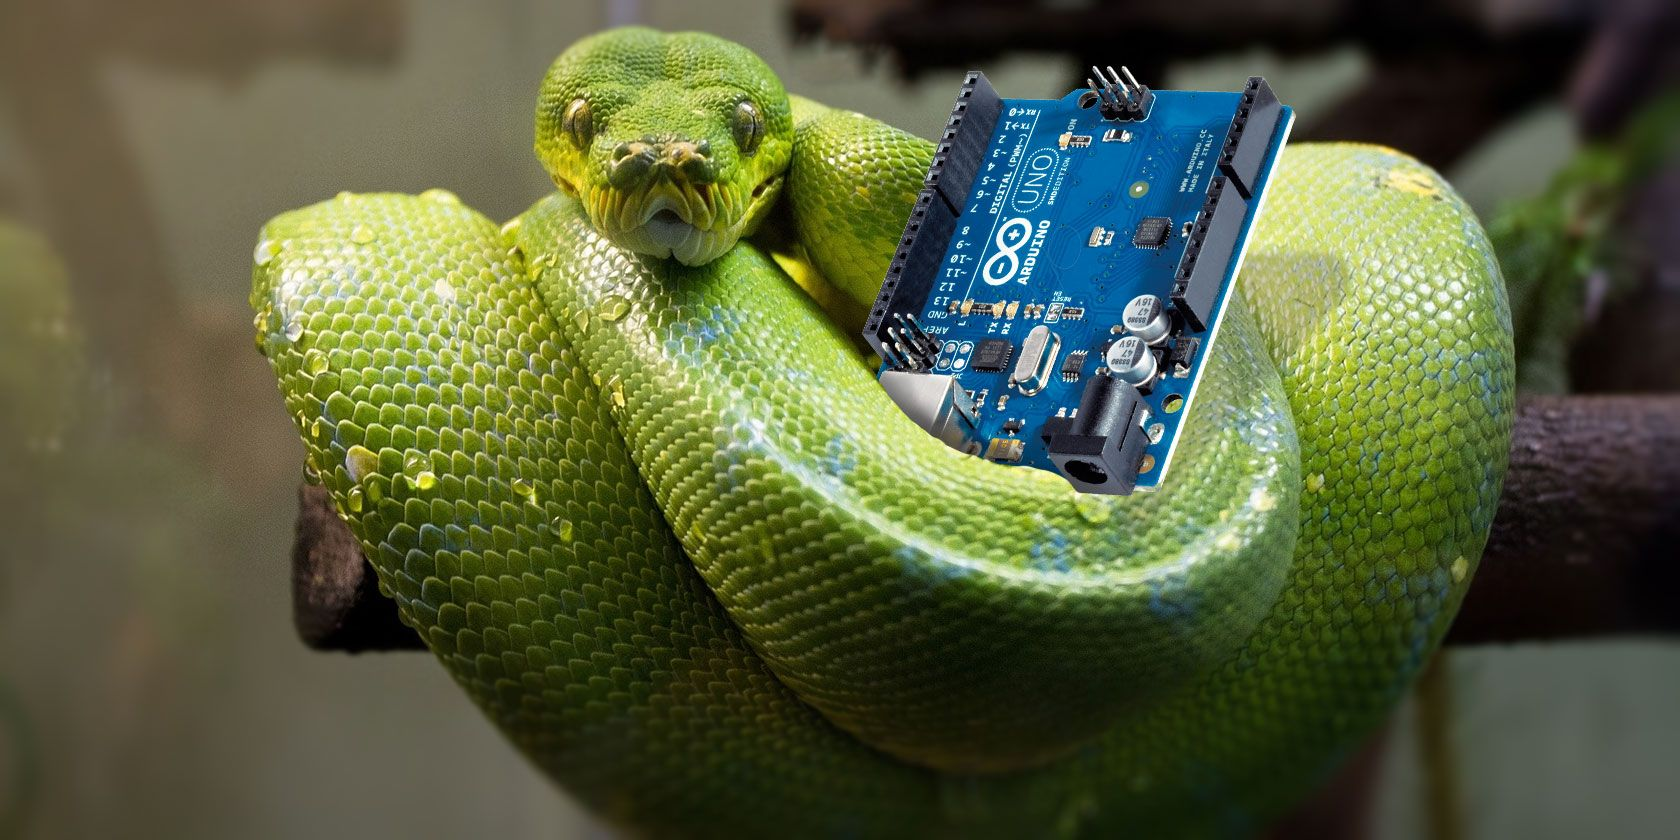 Image result for Python snake and program